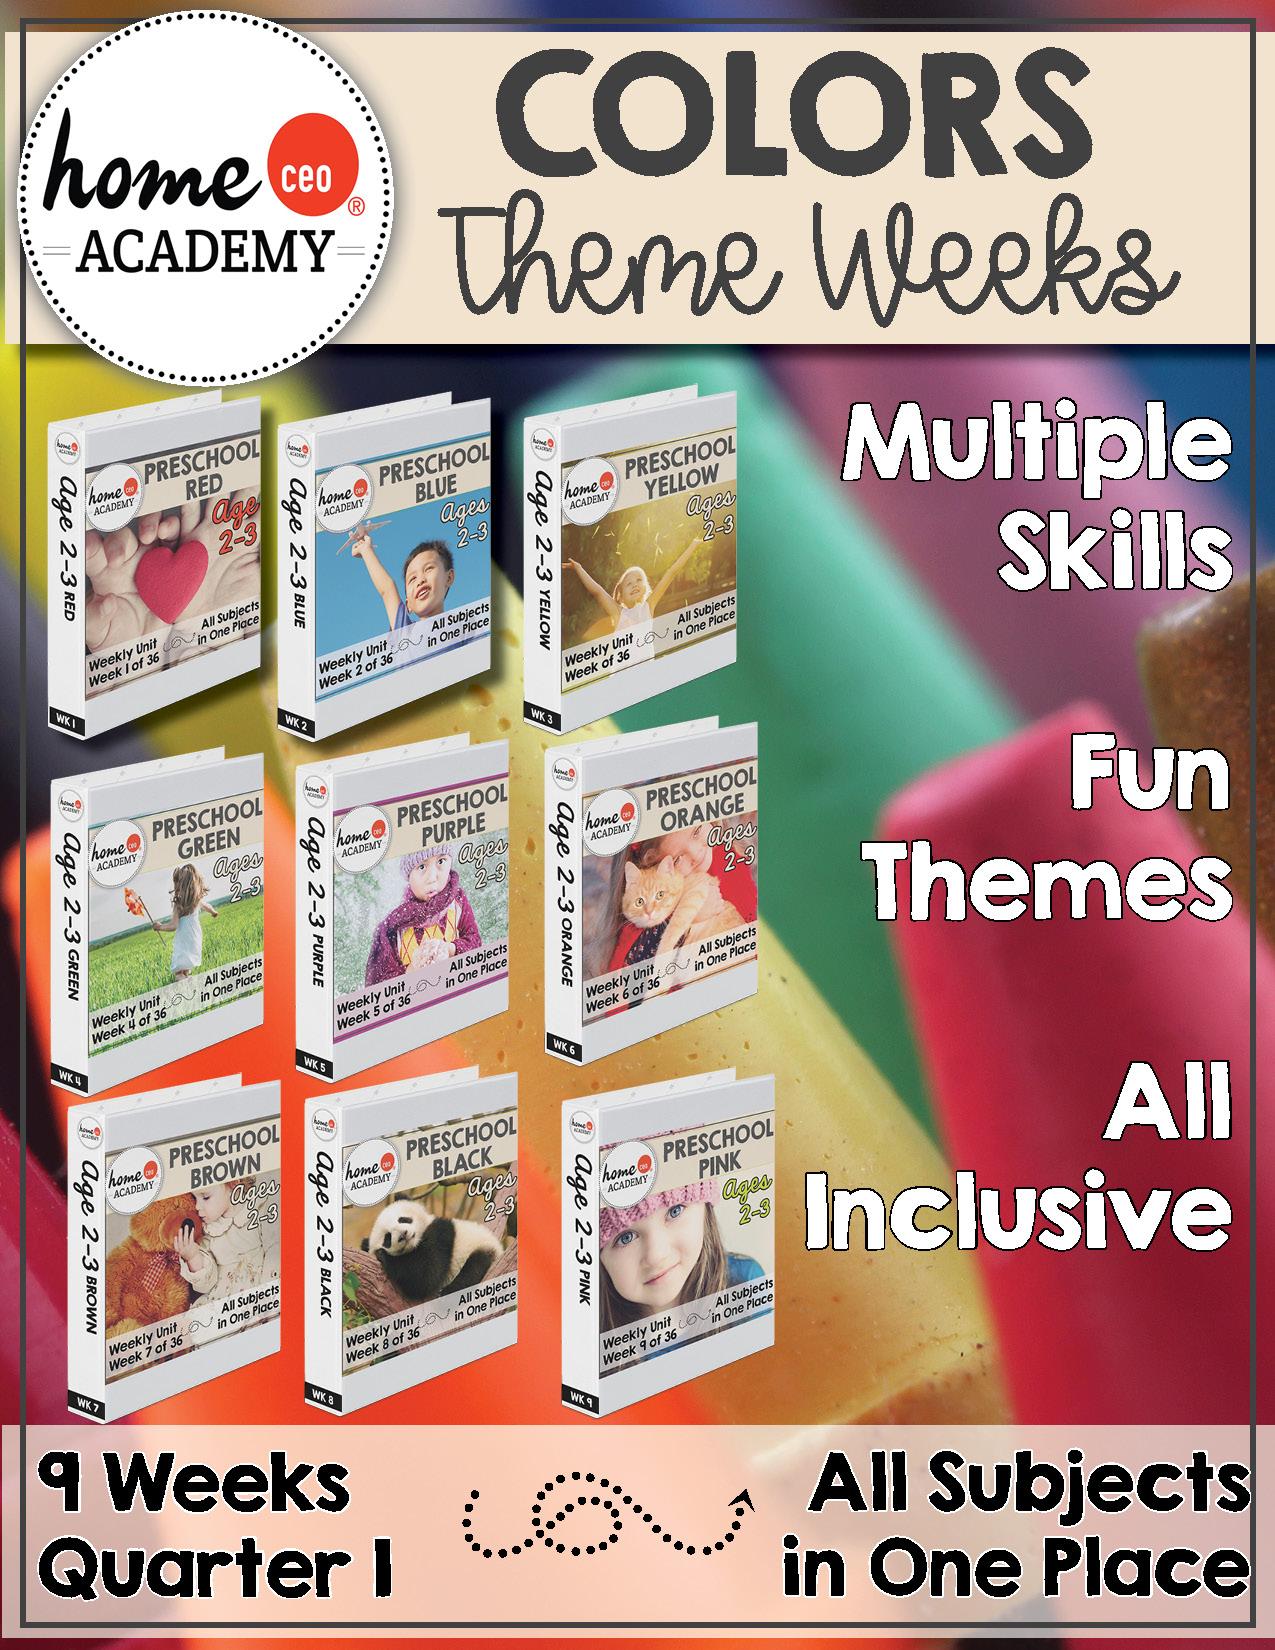 Preschool Curriculum Programs For Preschool Homeschool Day Care